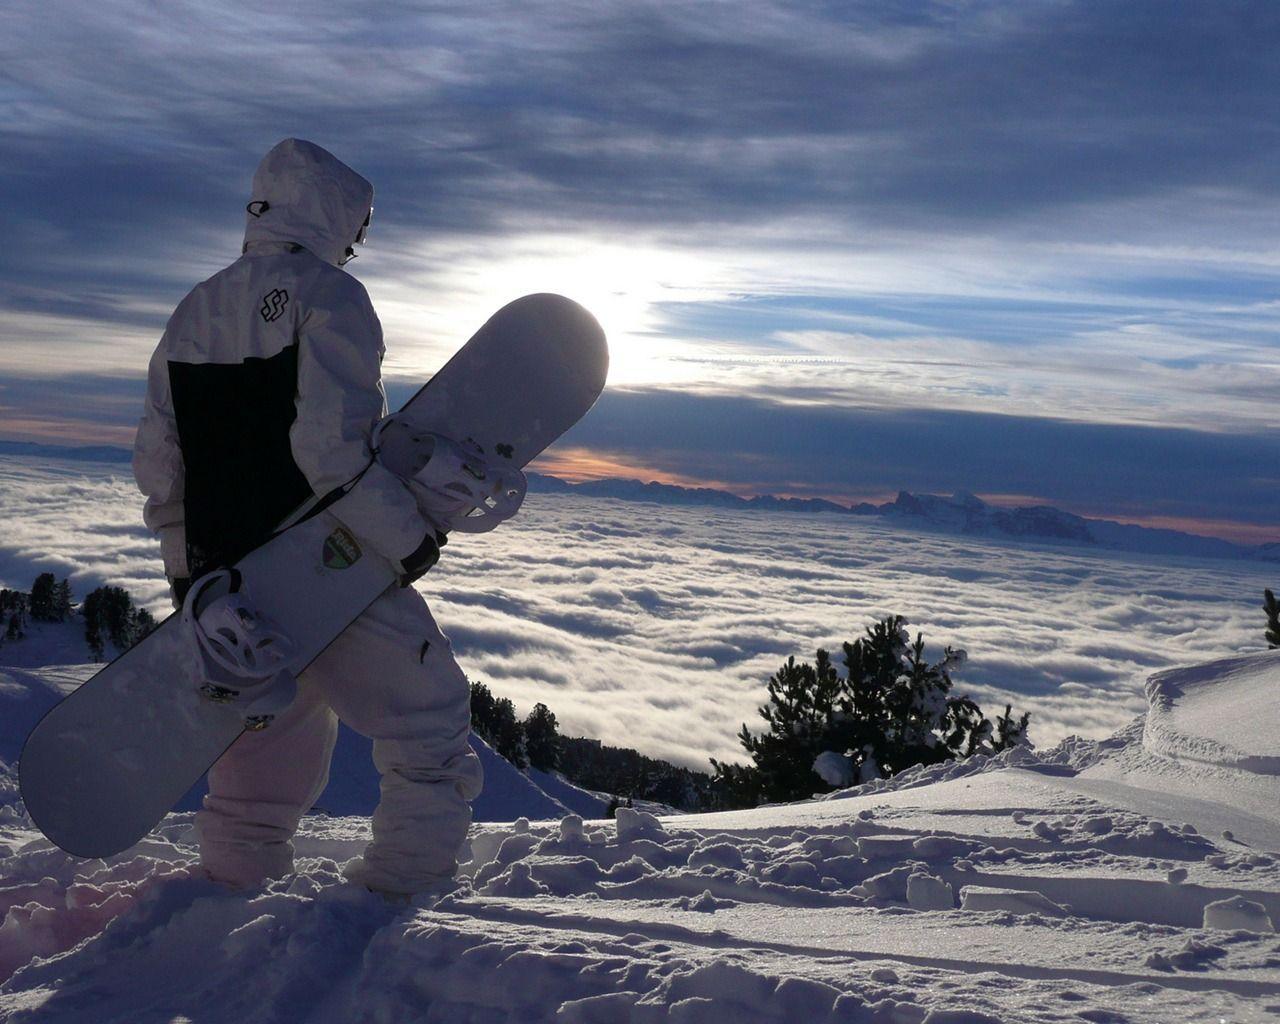 snowboarder heaven wallpaper | snowboarding wallpapers | hd